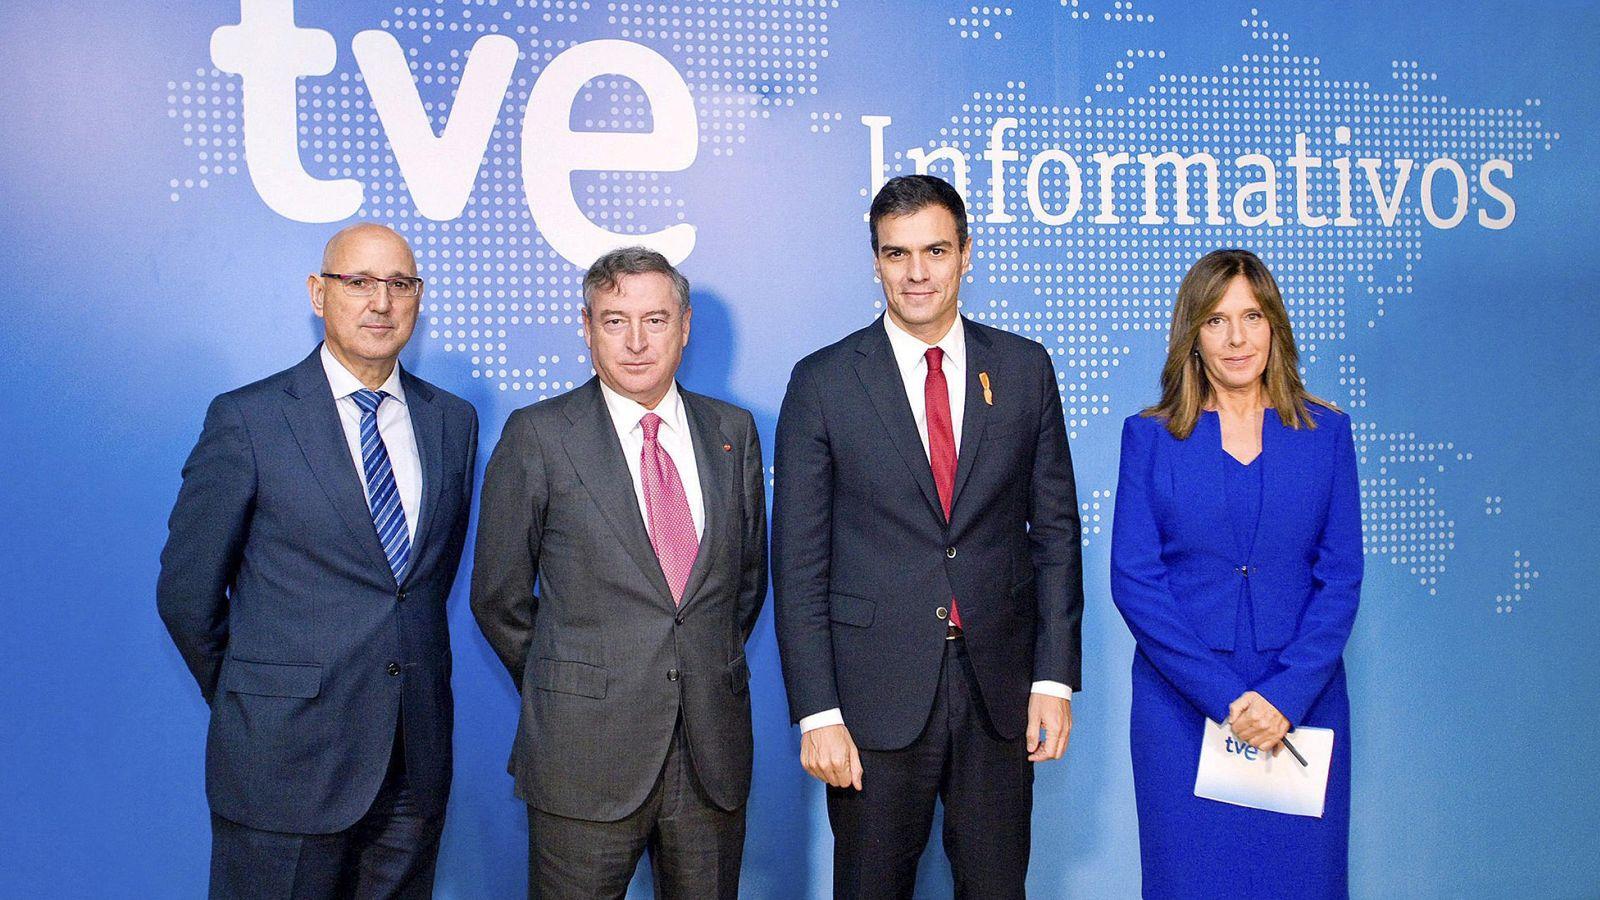 Foto: El presidente de RTVE, José Antonio Sánchez (segundo por la izqda.), junto al secretario general del PSOE, Pedro Sánchez (segundo por la derecha). (EFE)